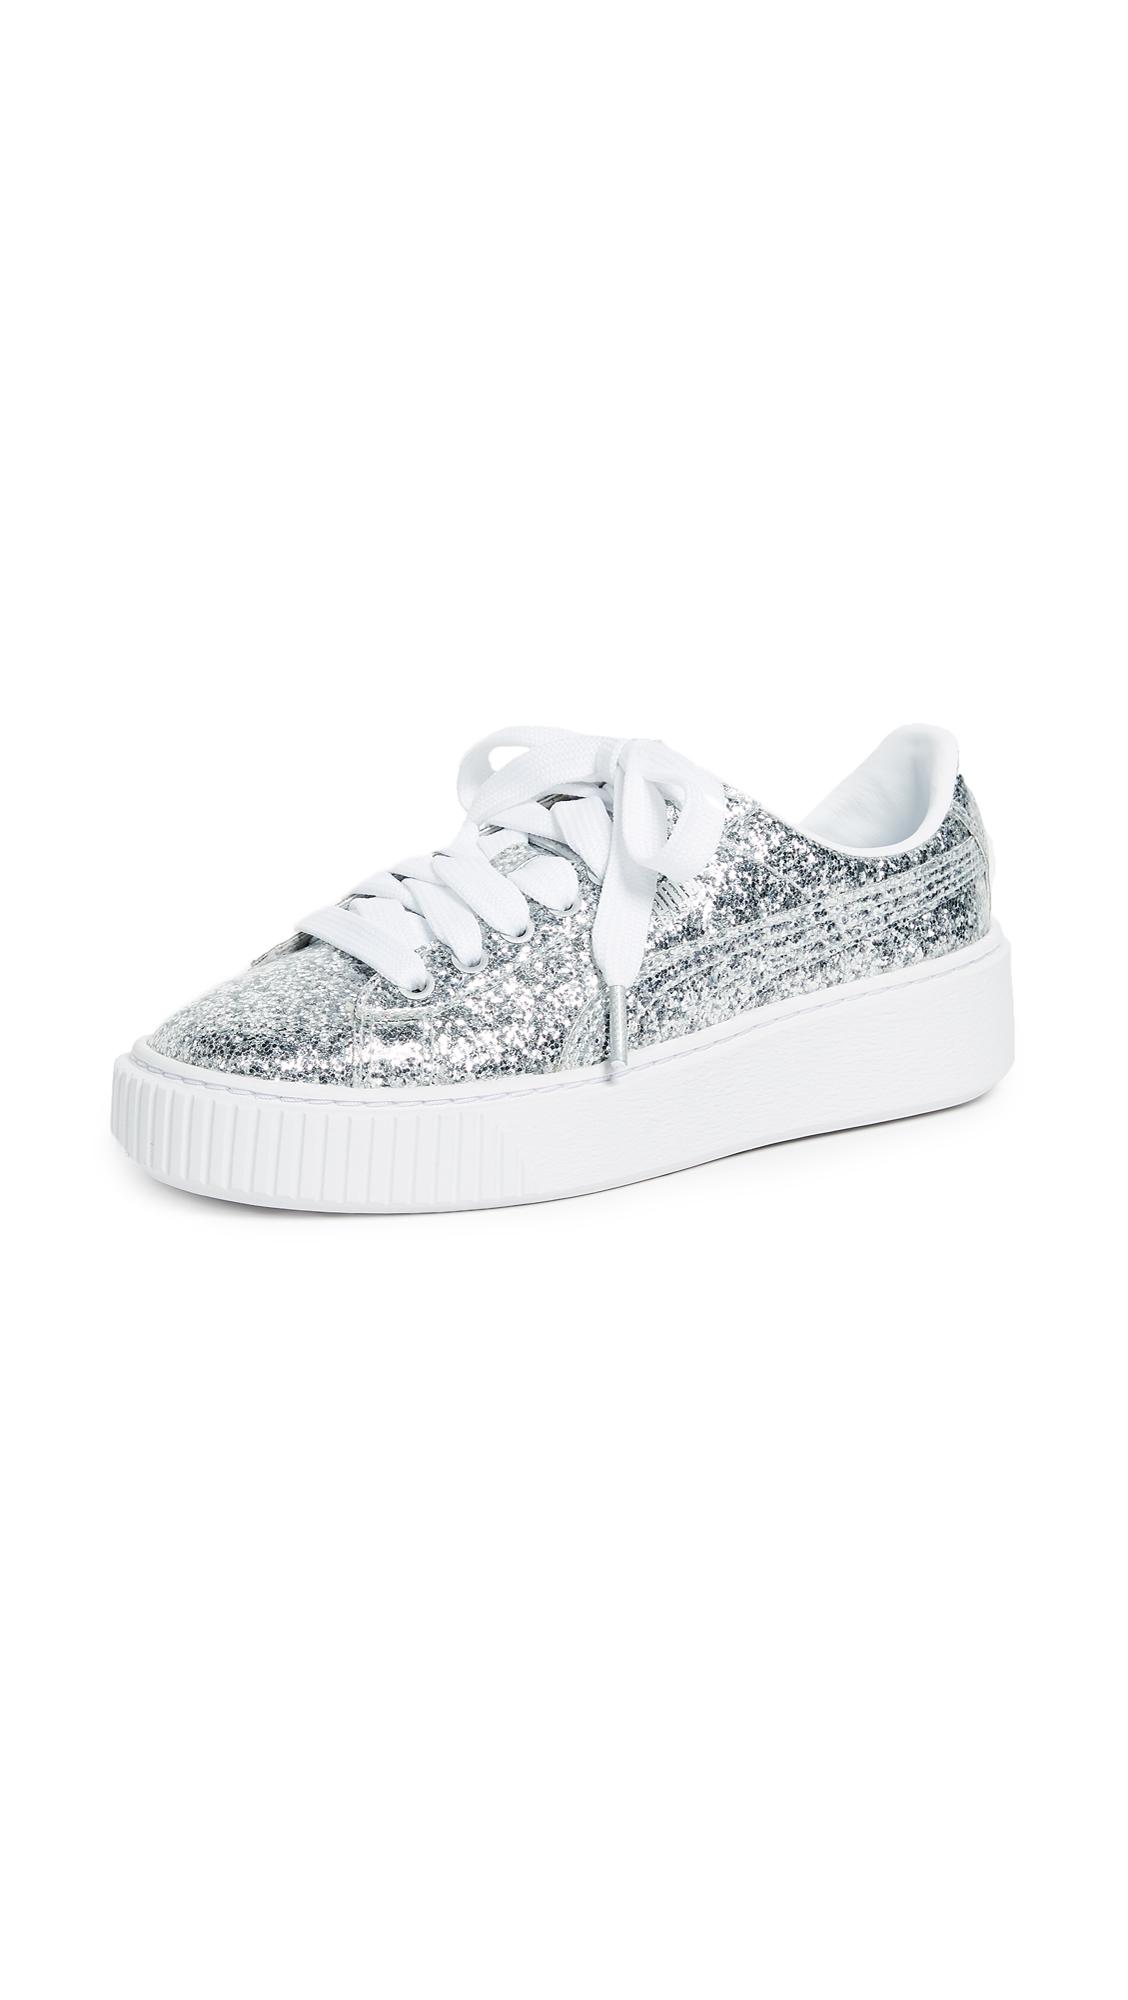 PUMA Basket Platform Glitter Sneakers - Silver/Silver